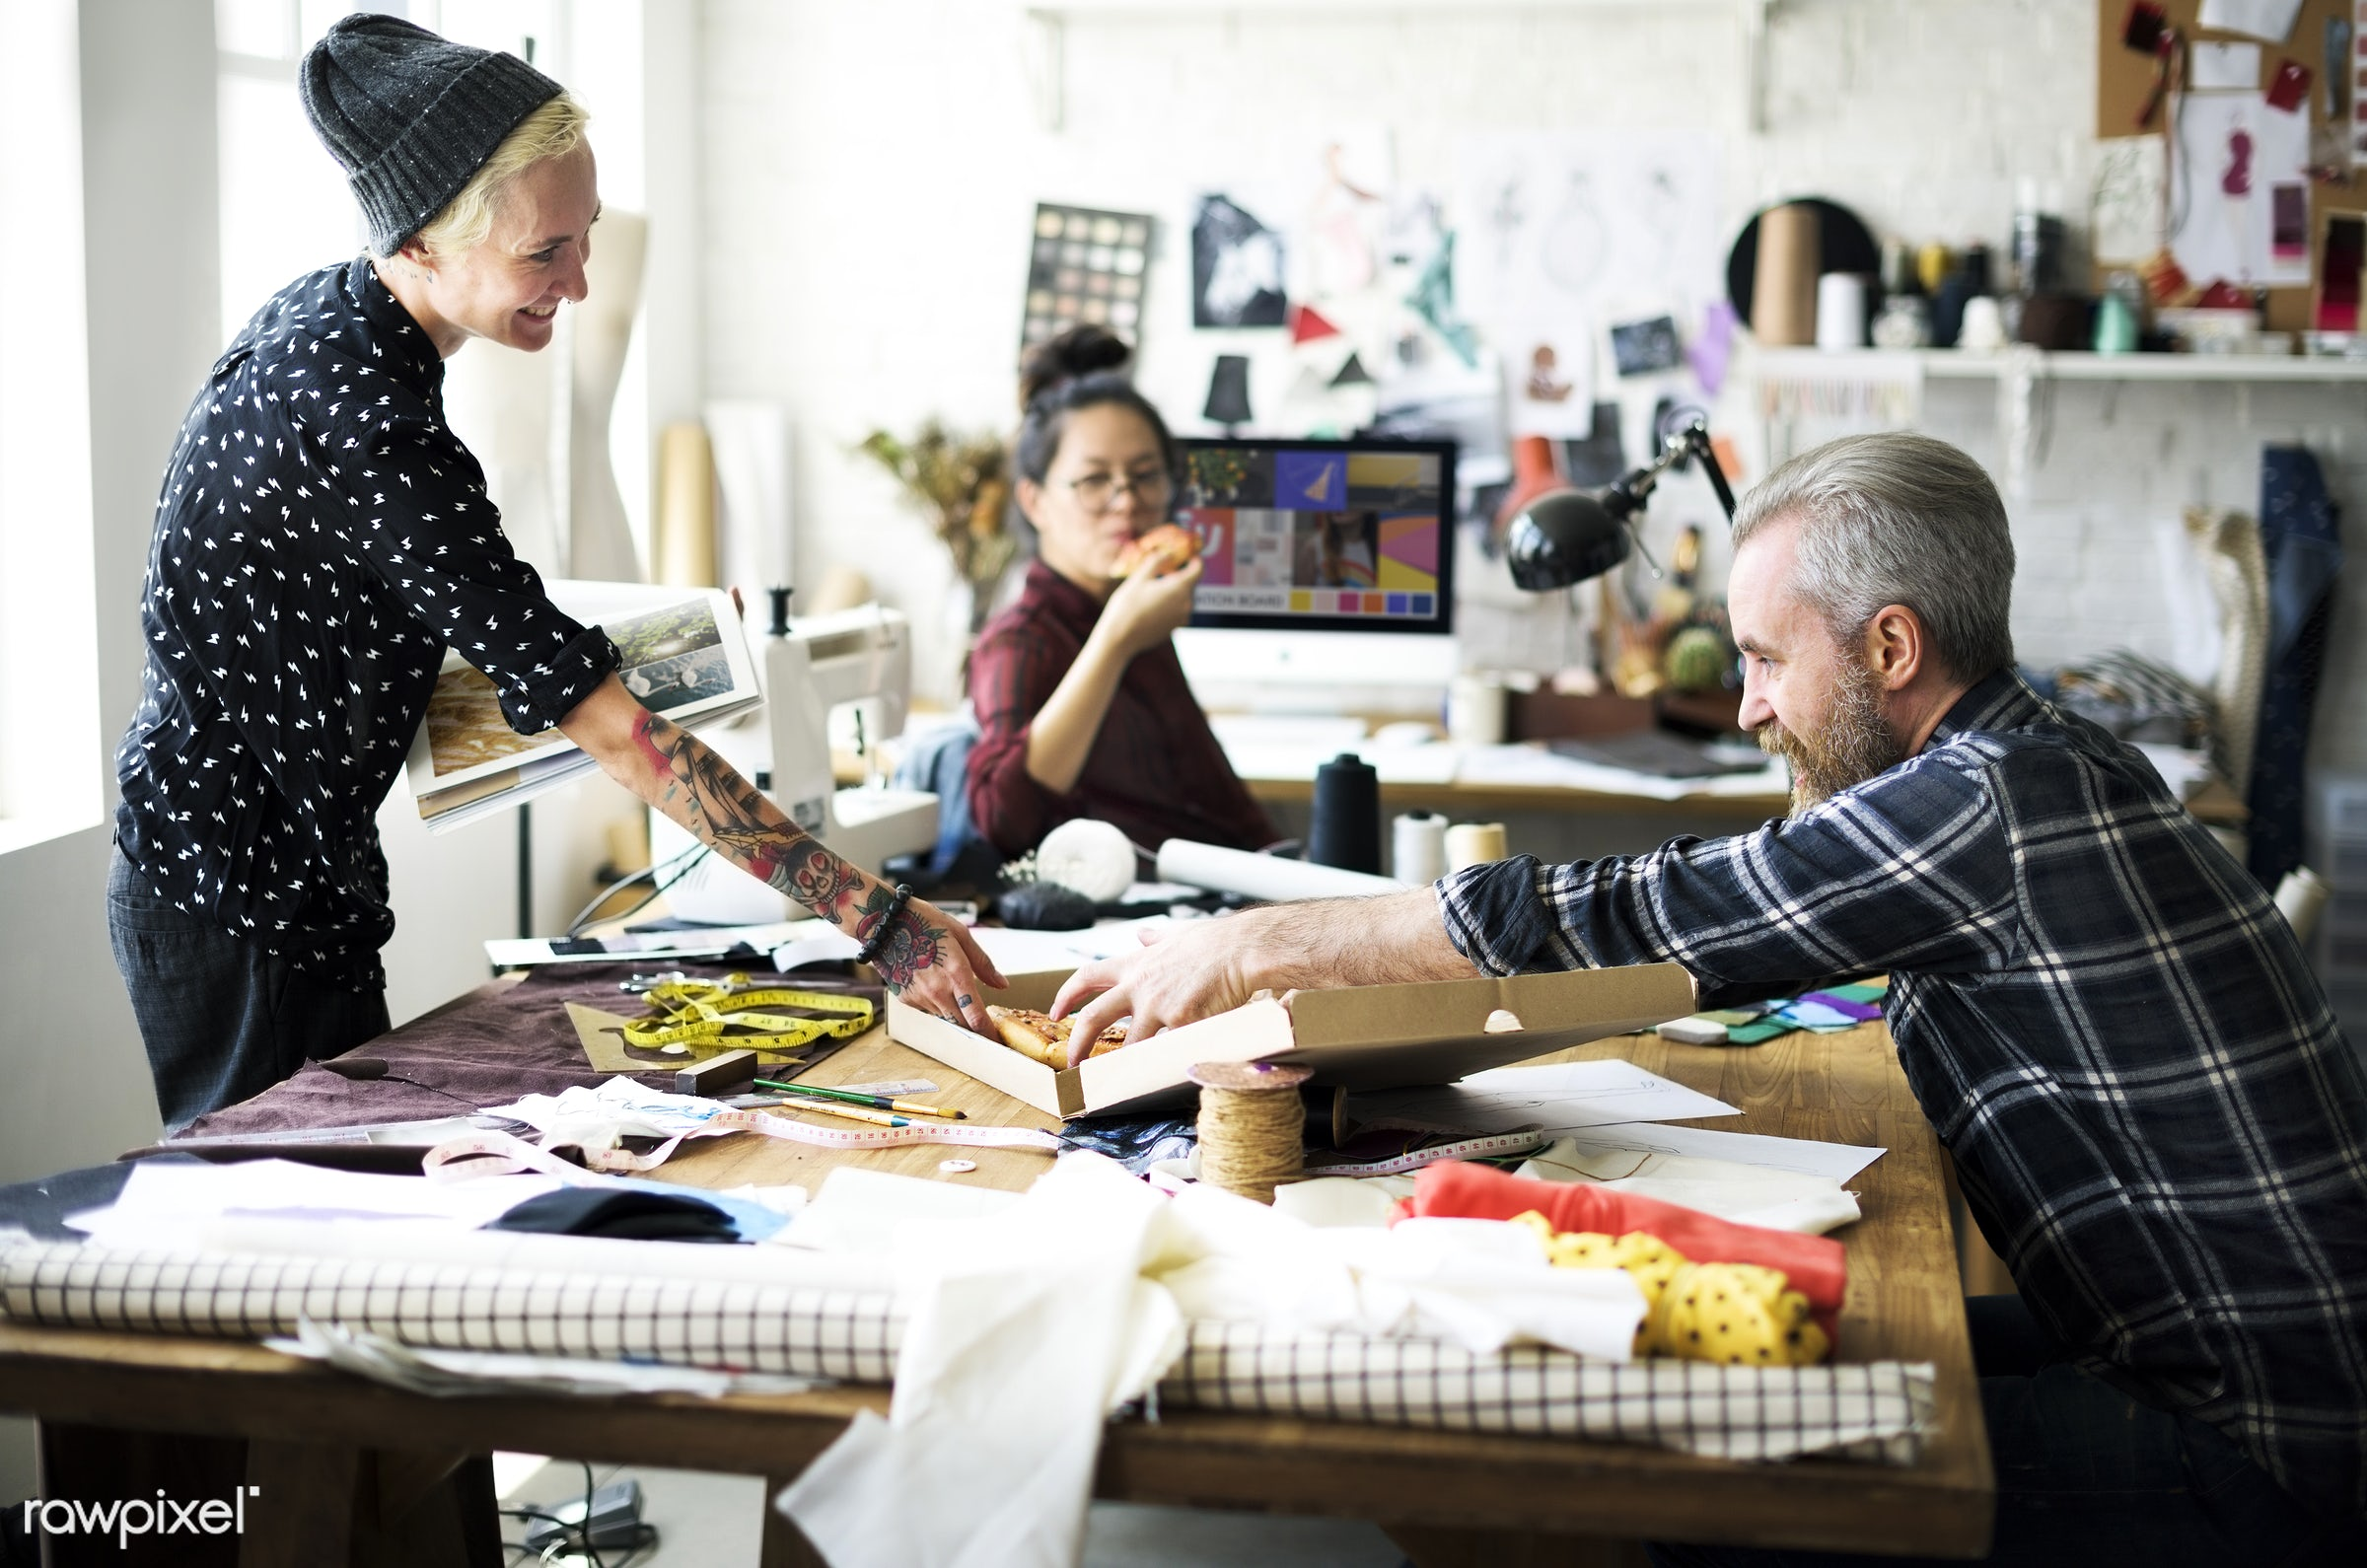 studio, craft, designing, profession, busy, equipment, production, break, teamwork, woman, lifestyle, thread, partner,...